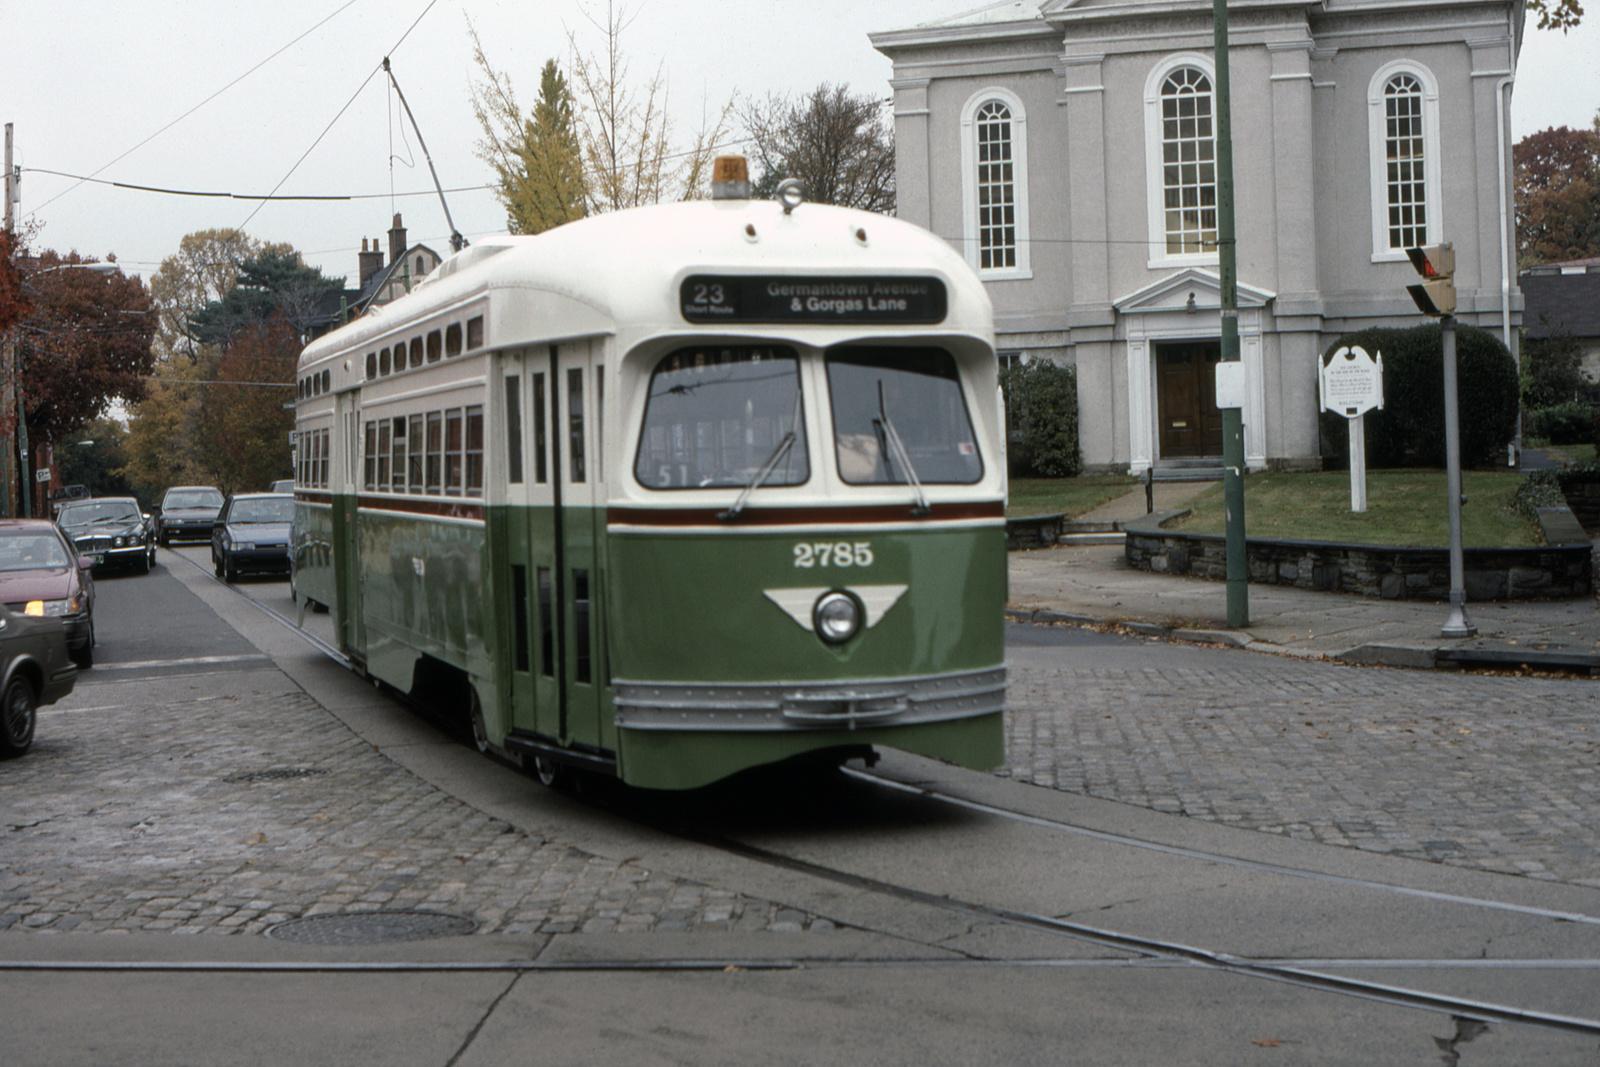 (679k, 1600x1067)<br><b>Country:</b> United States<br><b>City:</b> Philadelphia, PA<br><b>System:</b> SEPTA (or Predecessor)<br><b>Line:</b> Rt. 23-Germantown<br><b>Location:</b> Bethlehem Pike/Chestnut Hill Loop<br><b>Car:</b> PTC/SEPTA Postwar All-electric PCC (St.Louis, 1947) 2785 <br><b>Collection of:</b> David Pirmann<br><b>Date:</b> 11/1982<br><b>Viewed (this week/total):</b> 0 / 39